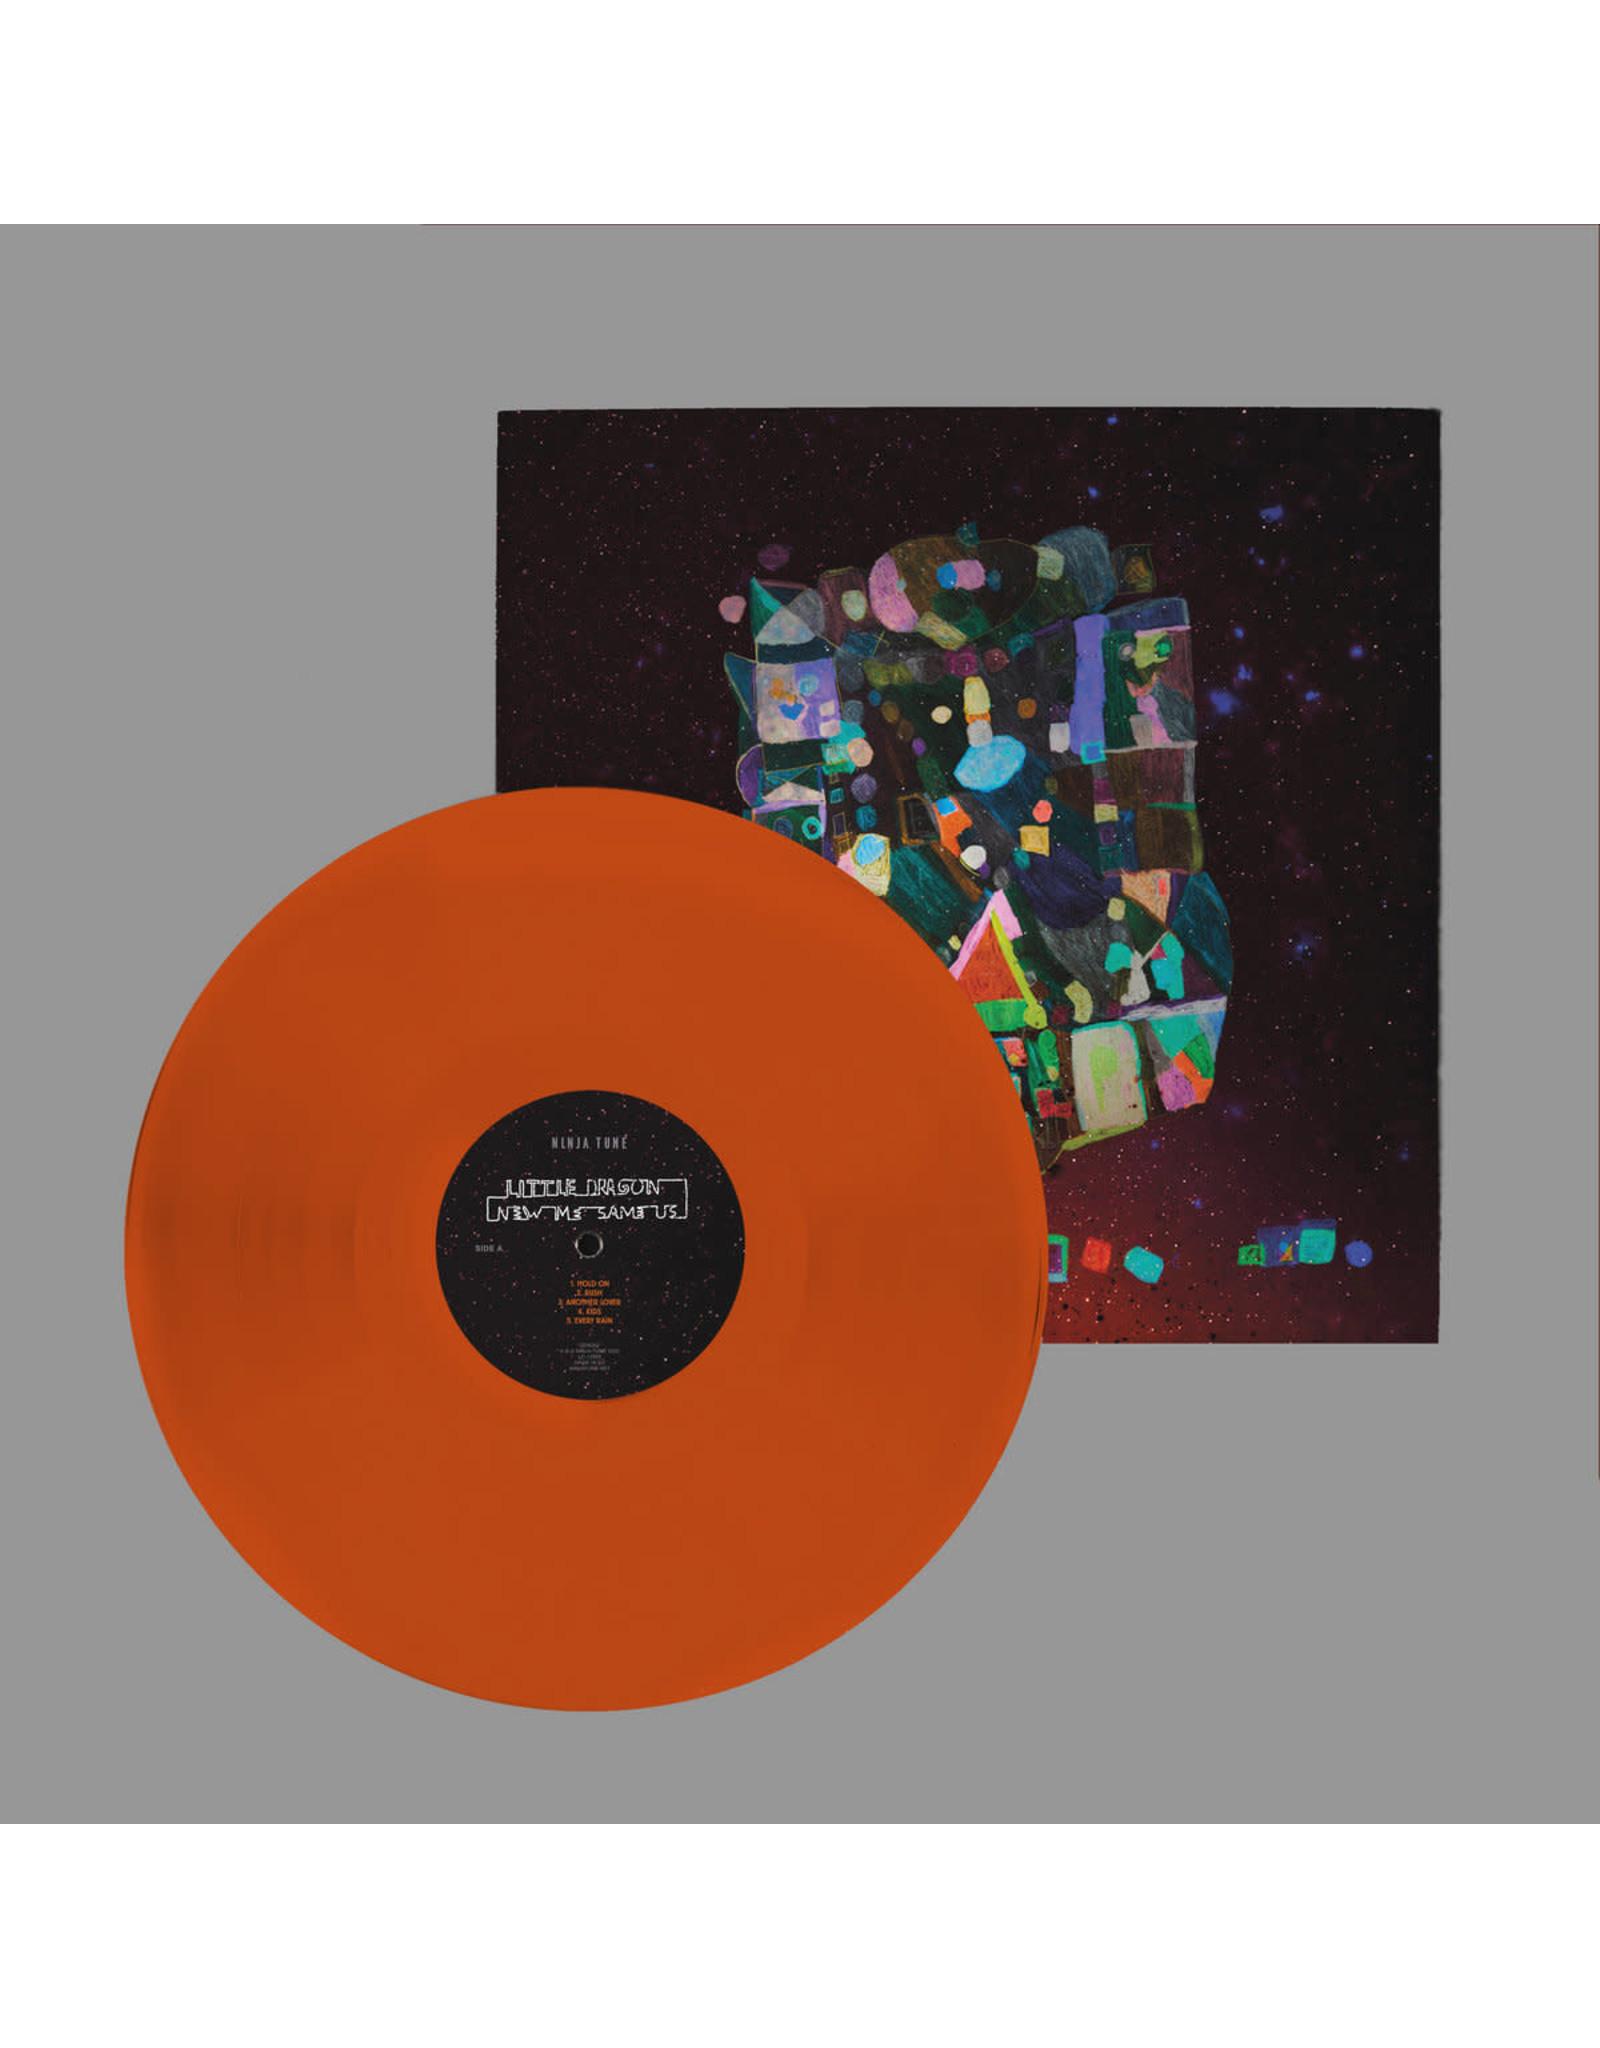 Little Dragon - New Me, Same Us (Exclusive Orange Vinyl)